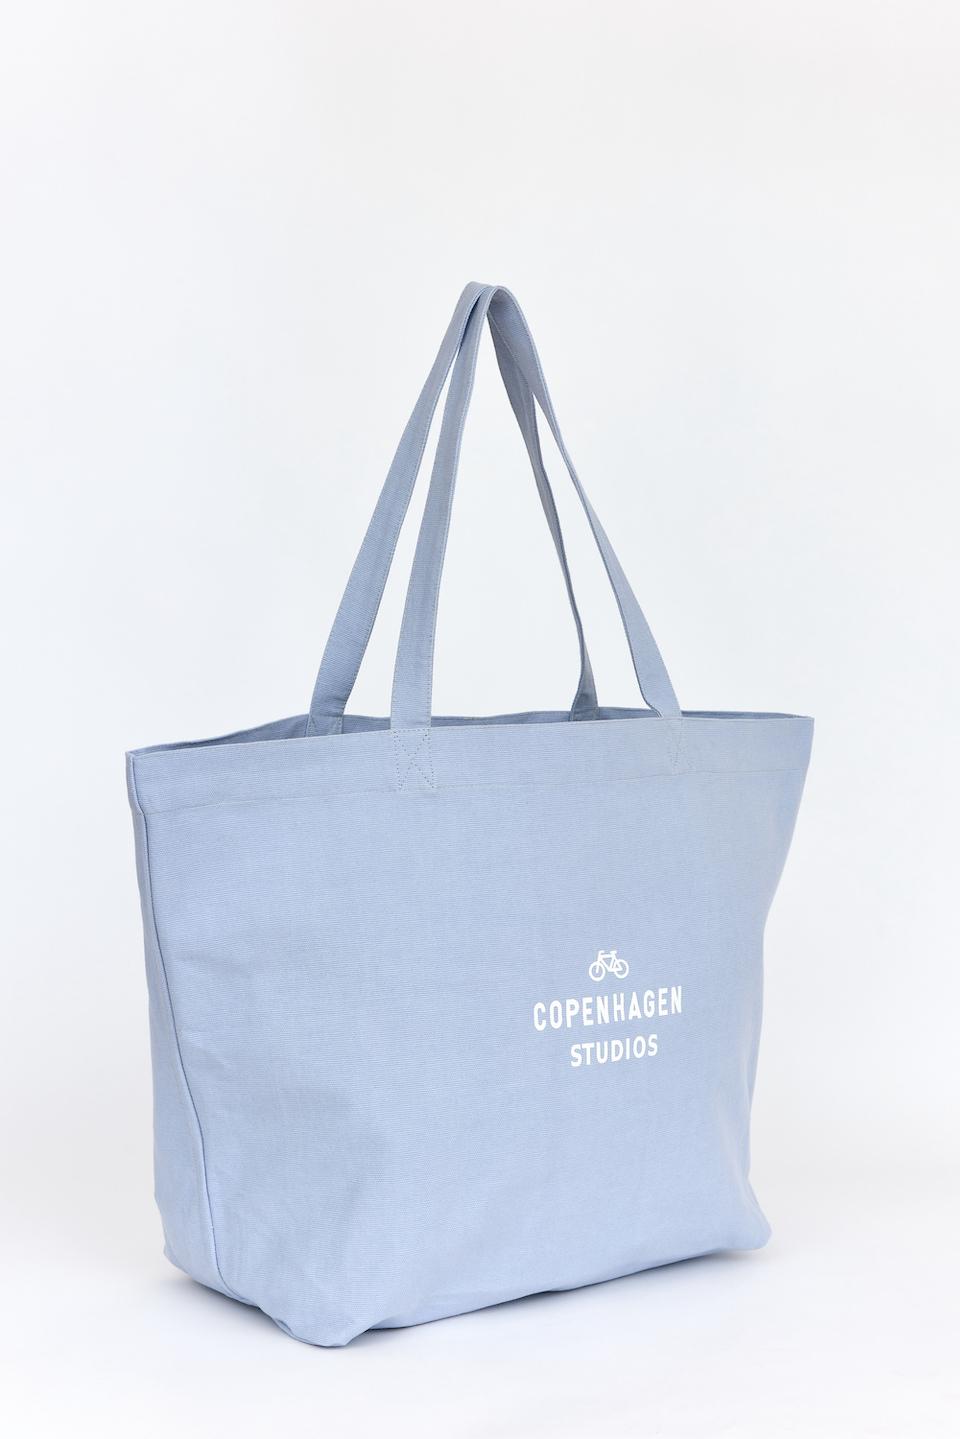 CPH BAG 015 recycle canvas blueberry - alternative 1